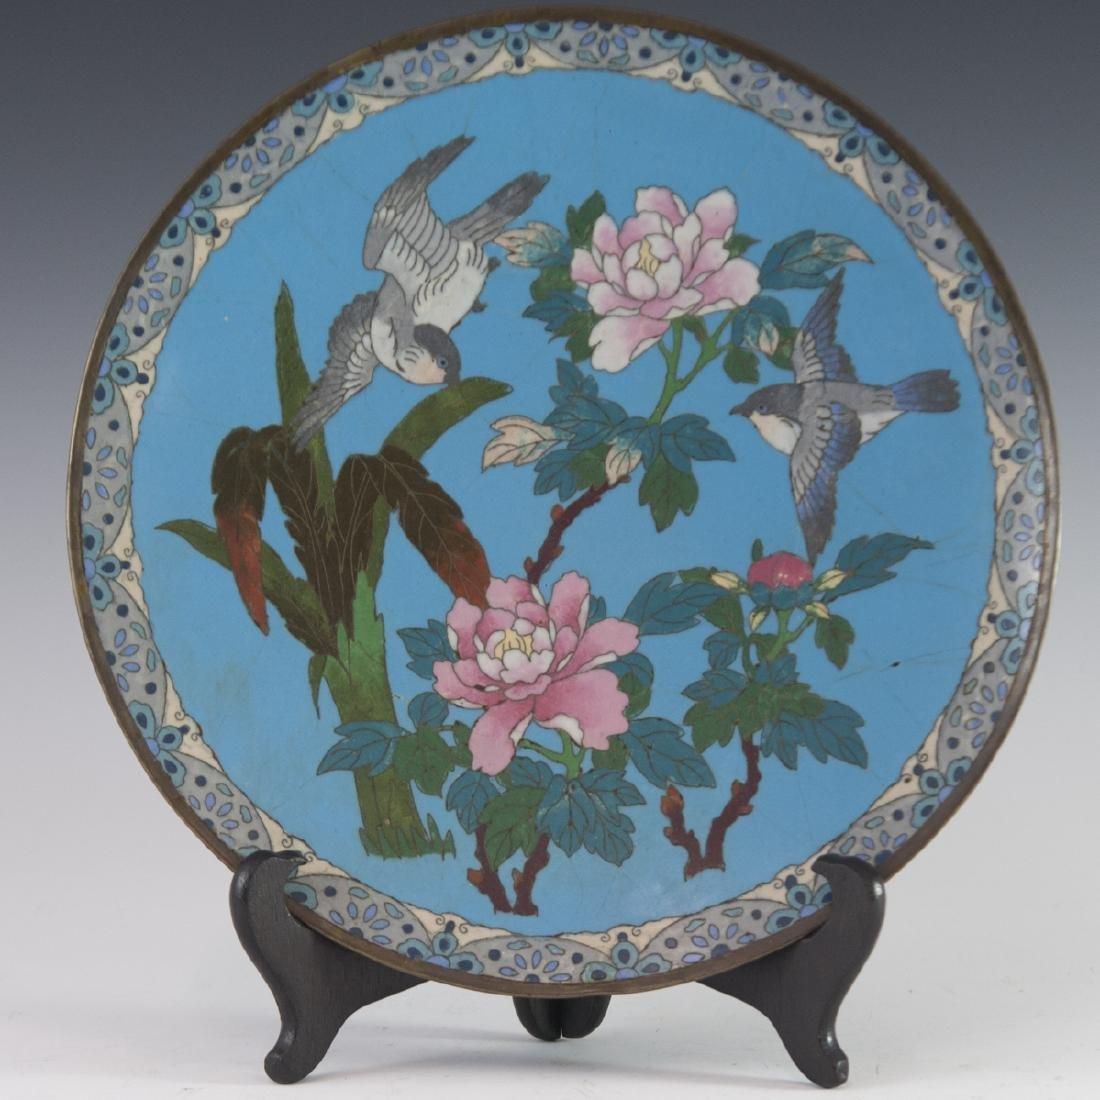 Antique Japanese Cloisonne Enameled Plate